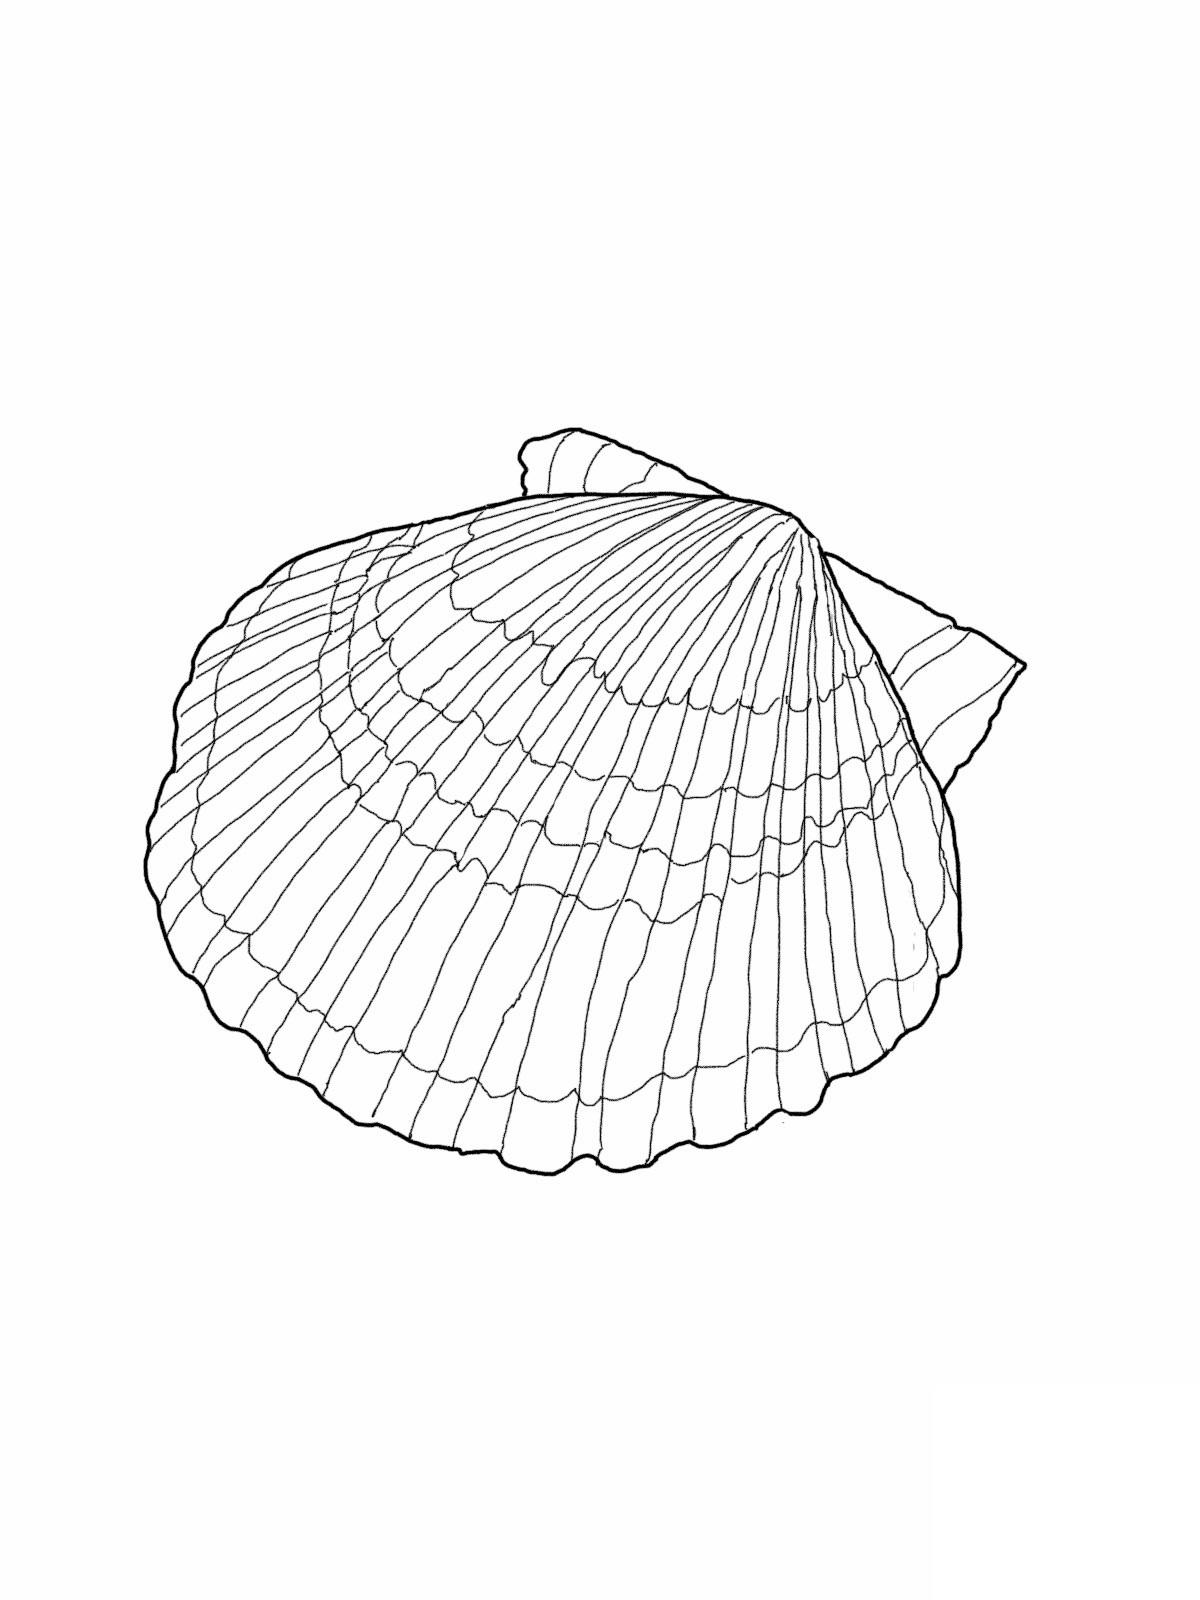 Seashell Coloring Page : seashell, coloring, Printable, Seashell, Coloring, Pages